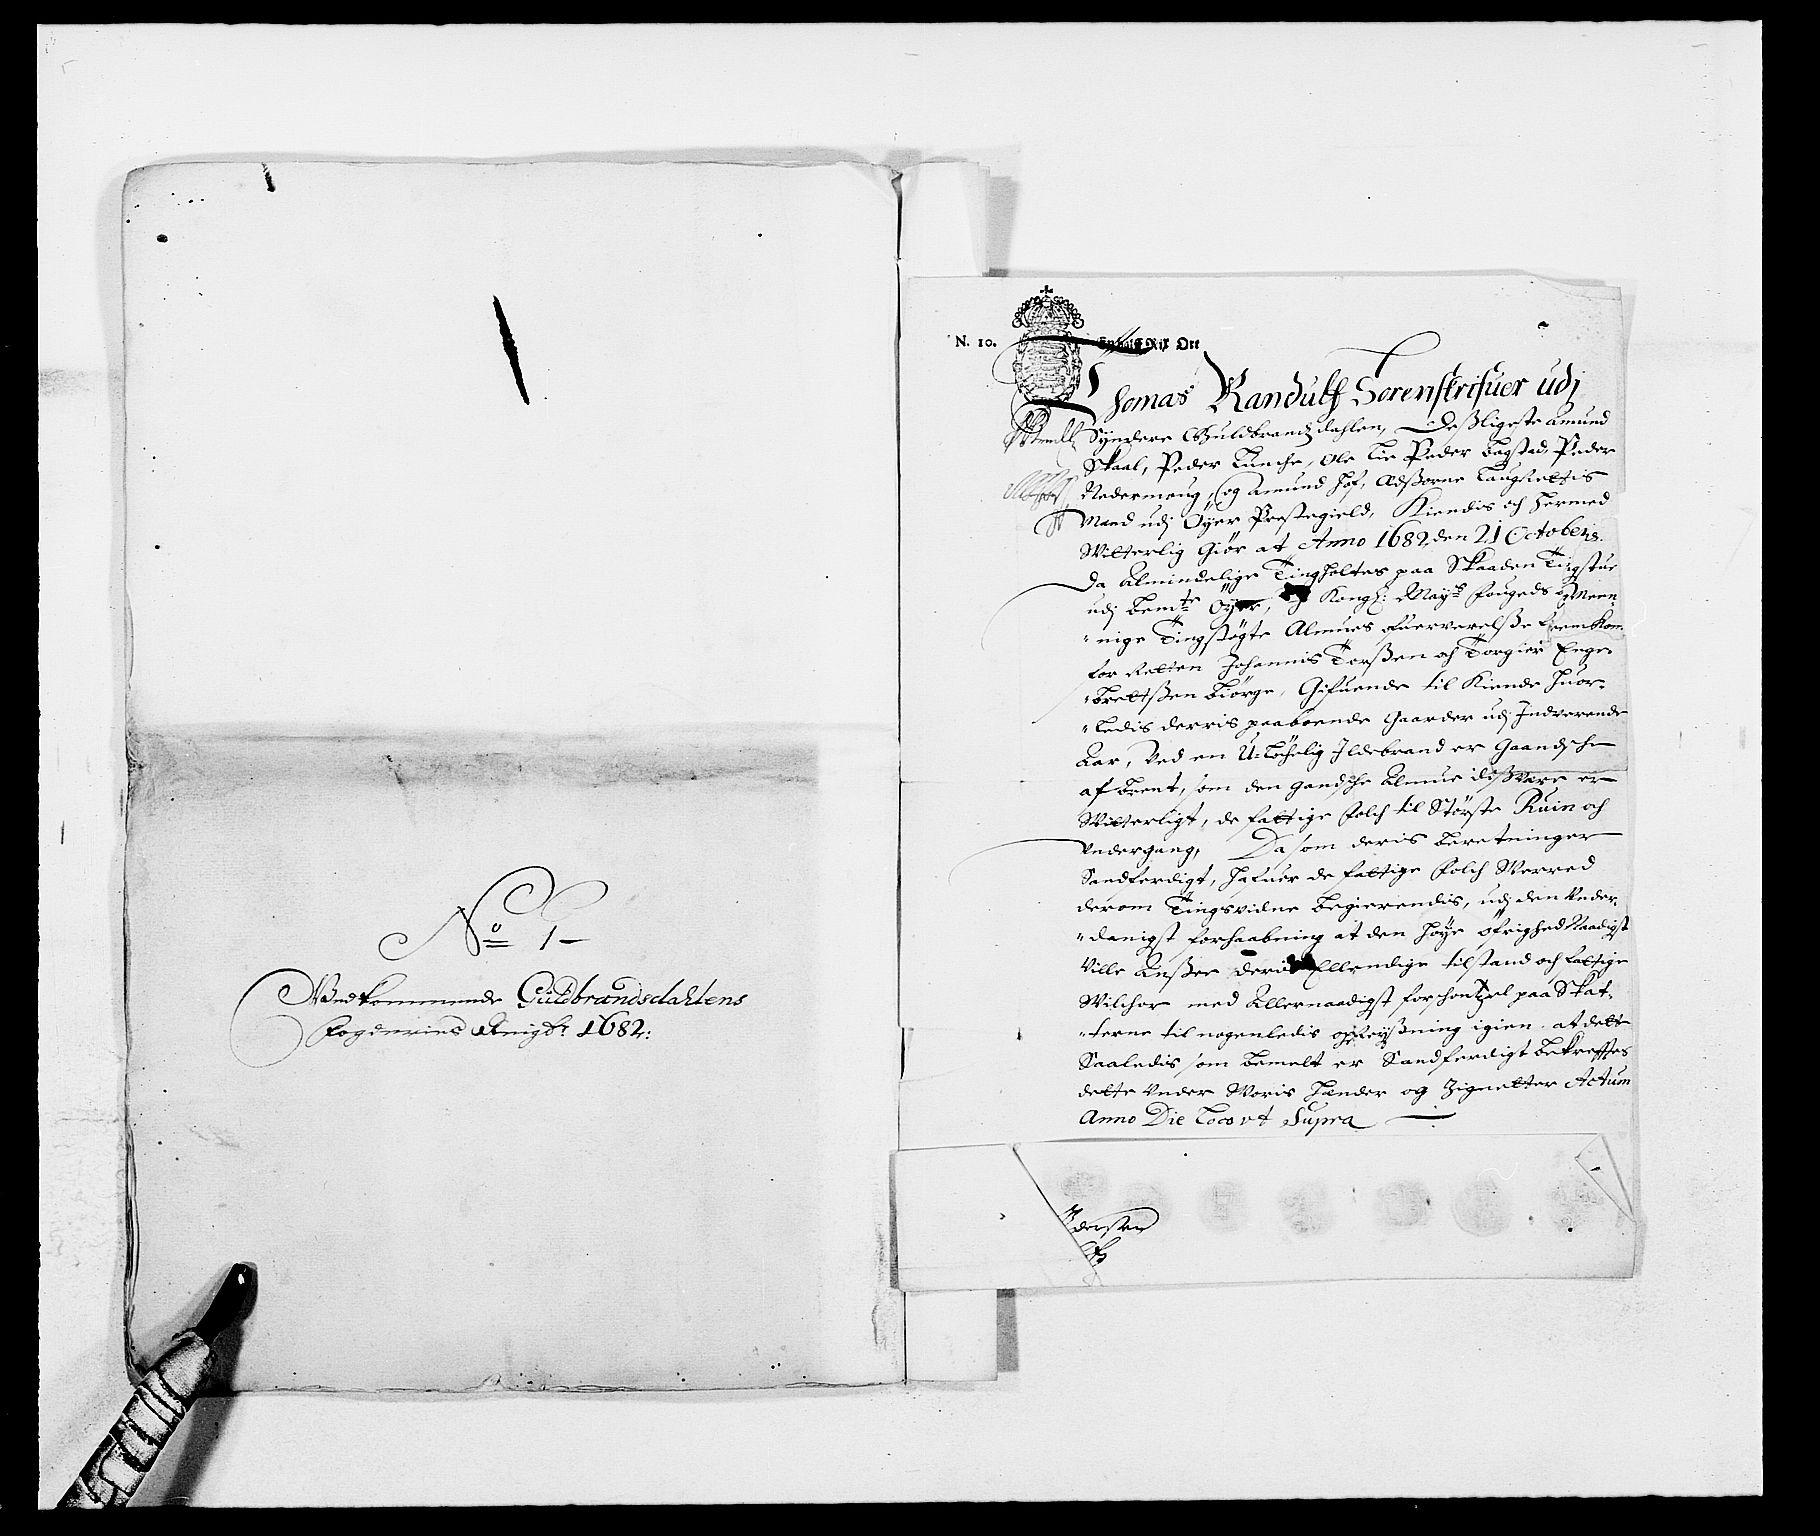 RA, Rentekammeret inntil 1814, Reviderte regnskaper, Fogderegnskap, R17/L1157: Fogderegnskap Gudbrandsdal, 1682-1689, s. 365